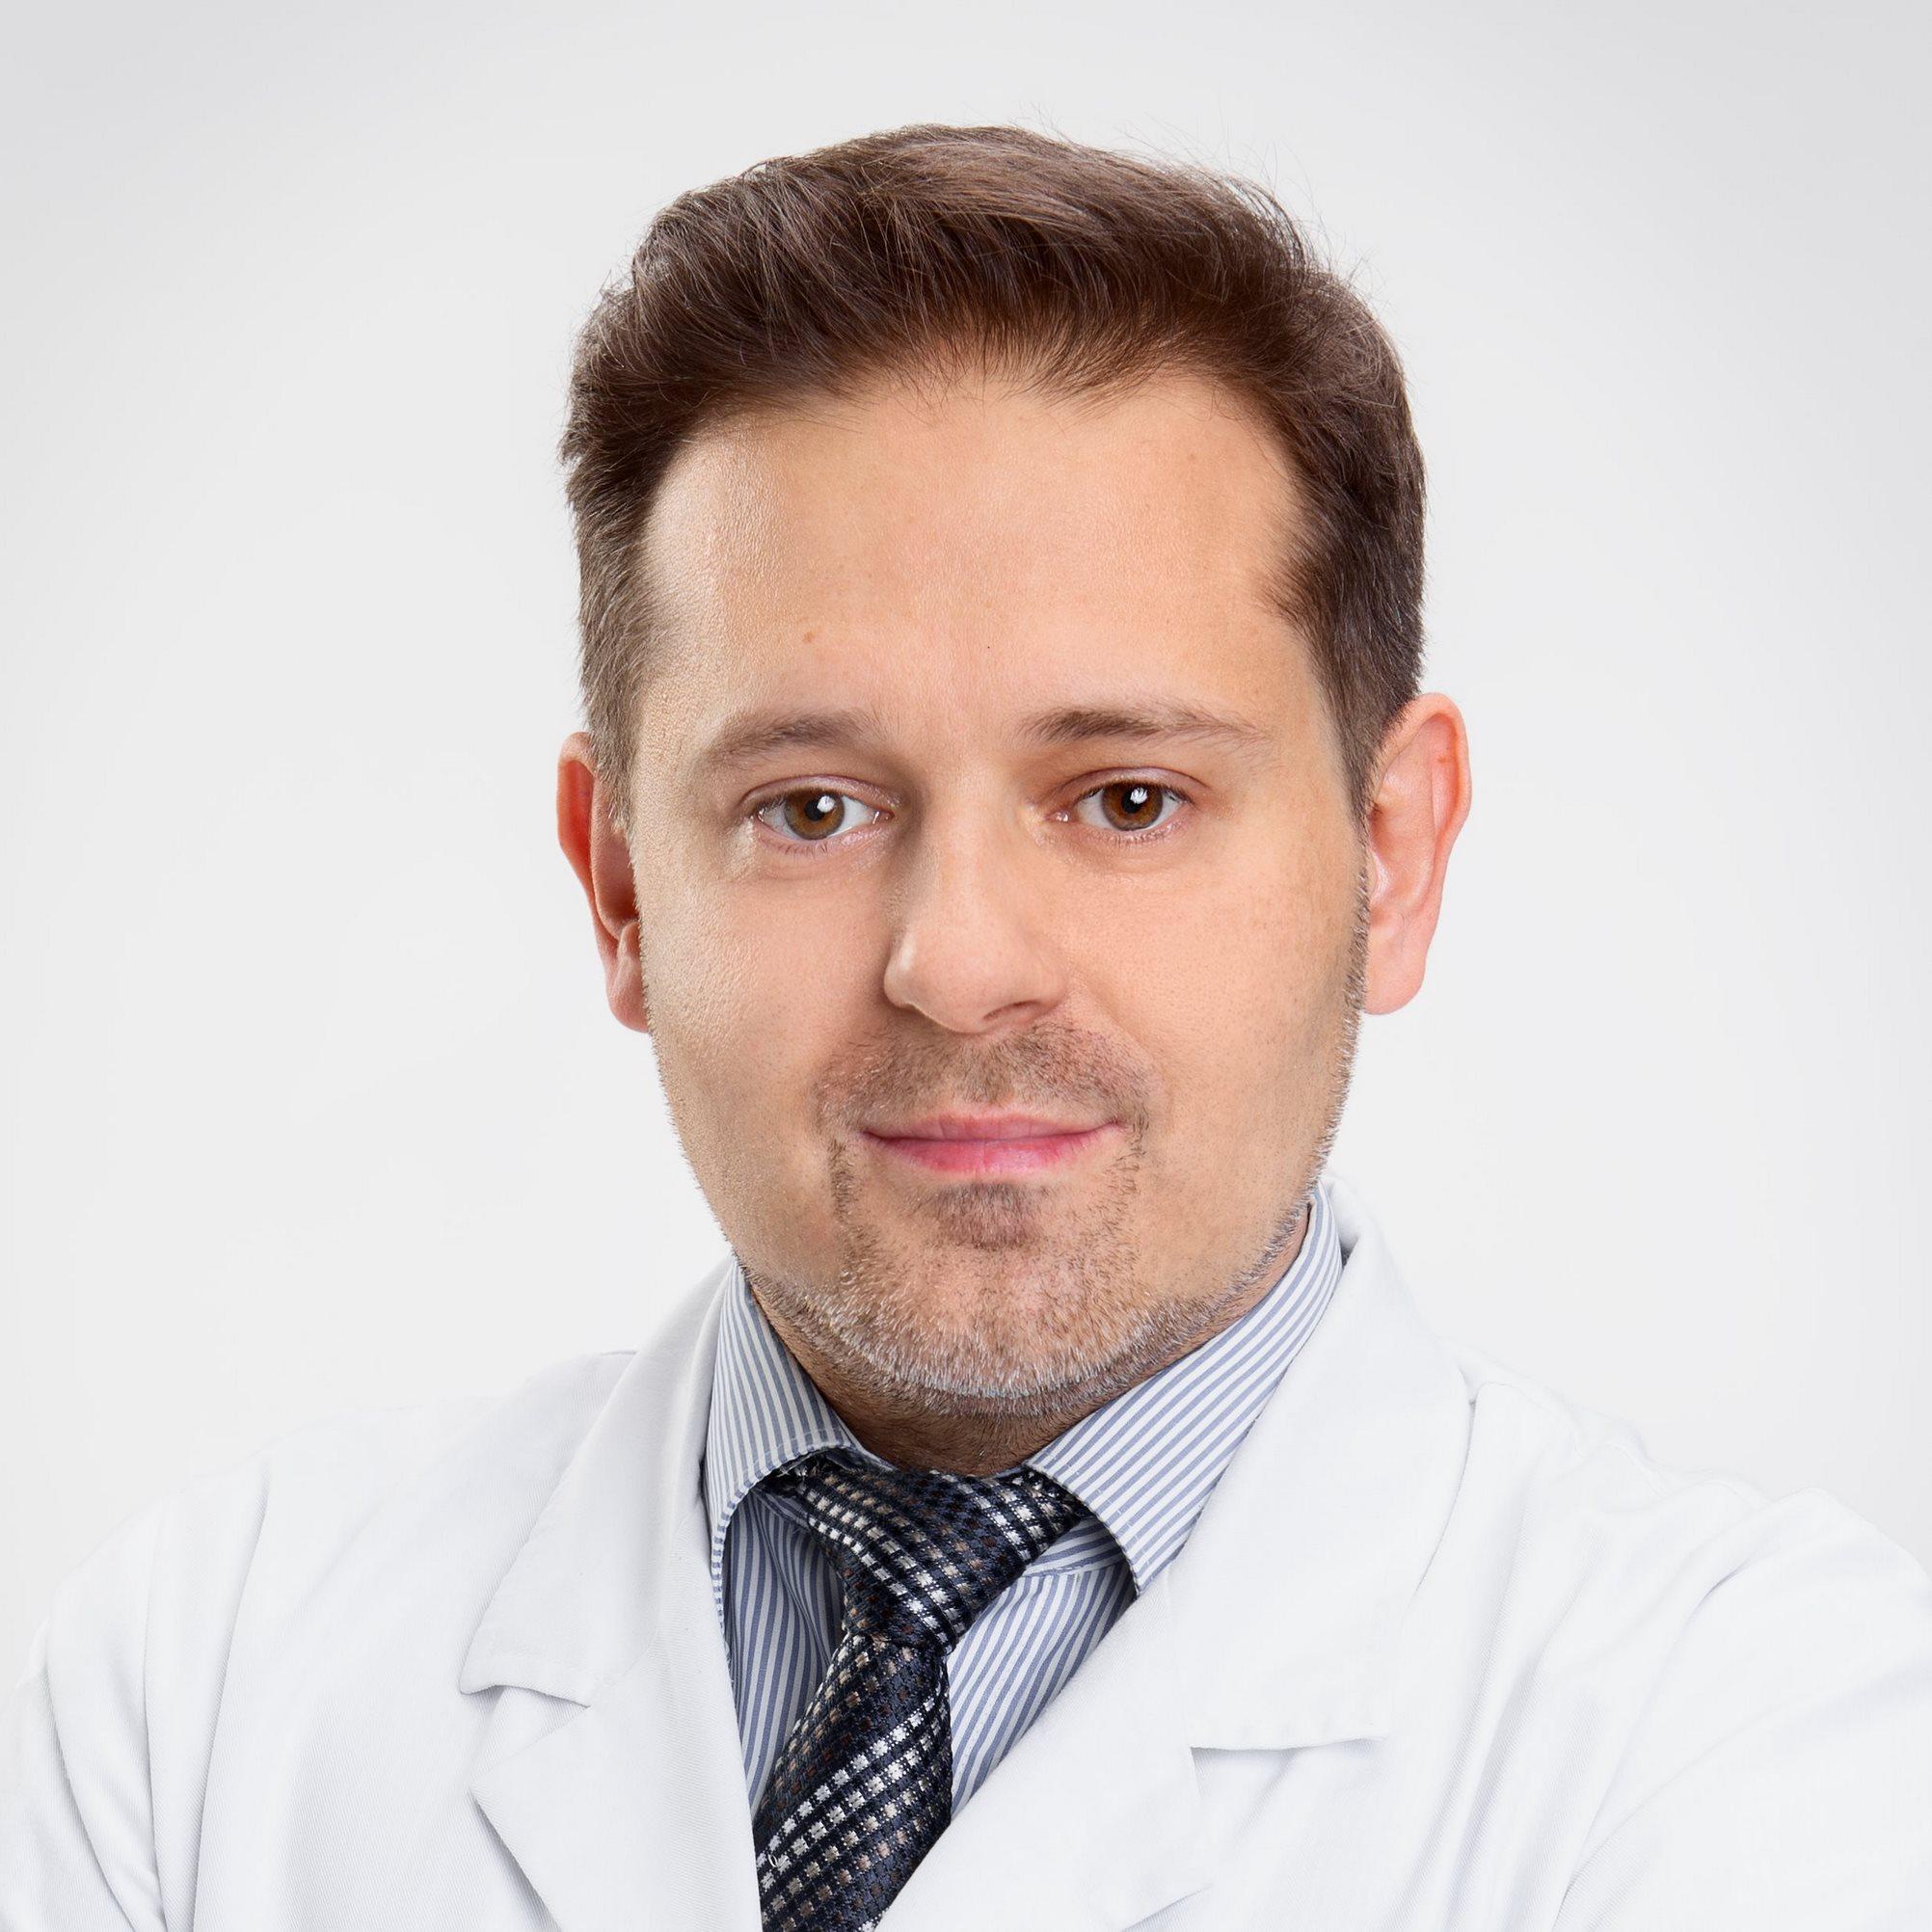 Oculomedica - Dr n. med. Bartosz Sikorski